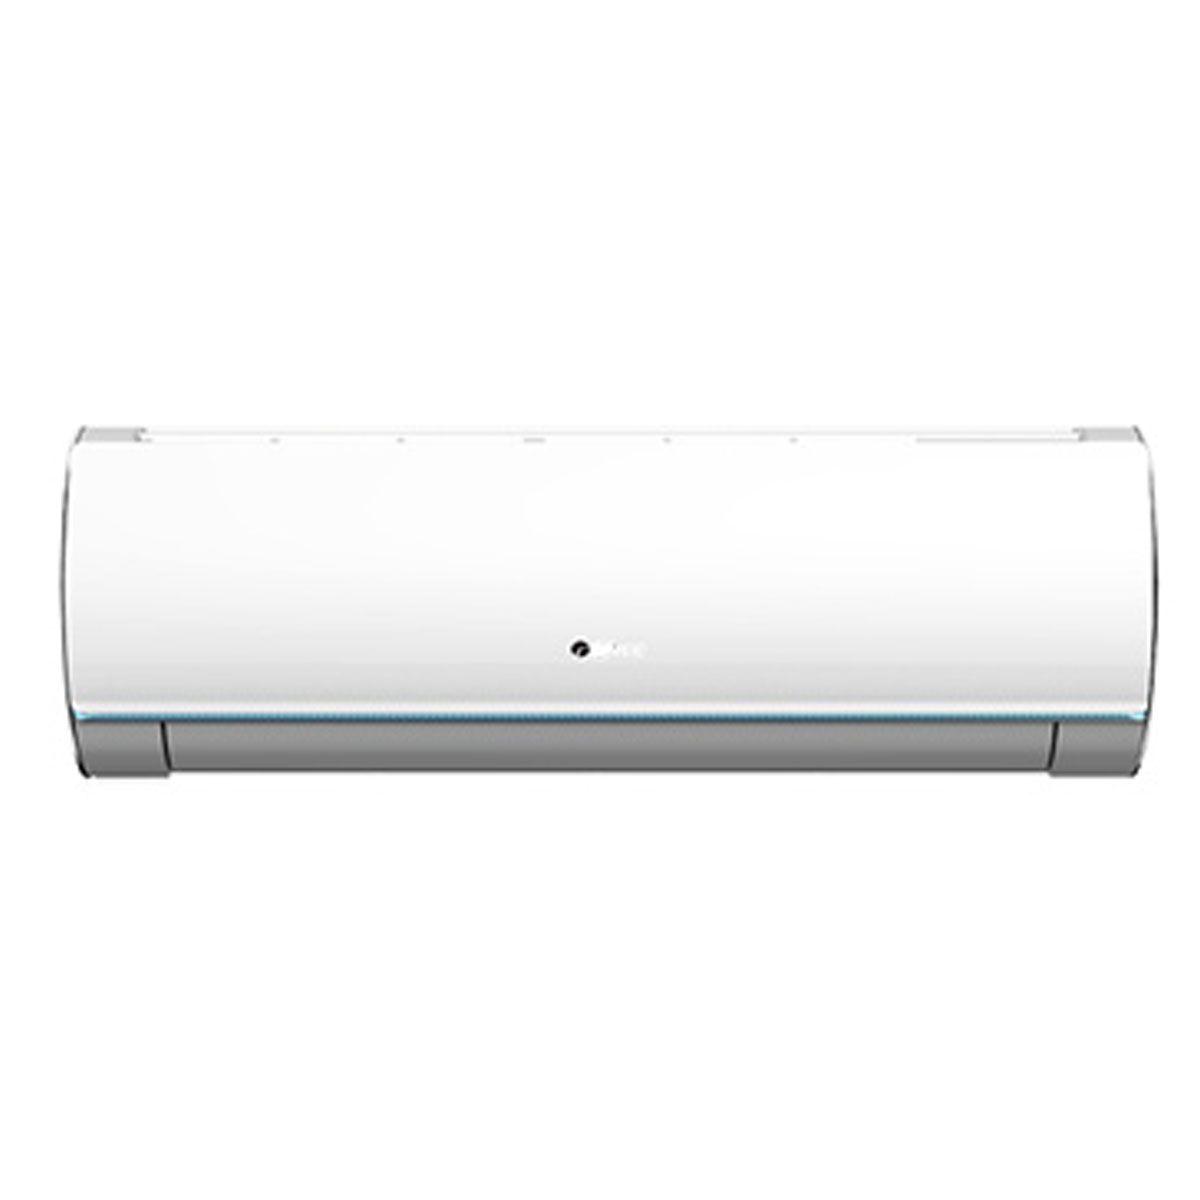 Gree 2.0 Ton Fairy Series Inverter Split AC (GS24FITH2W)